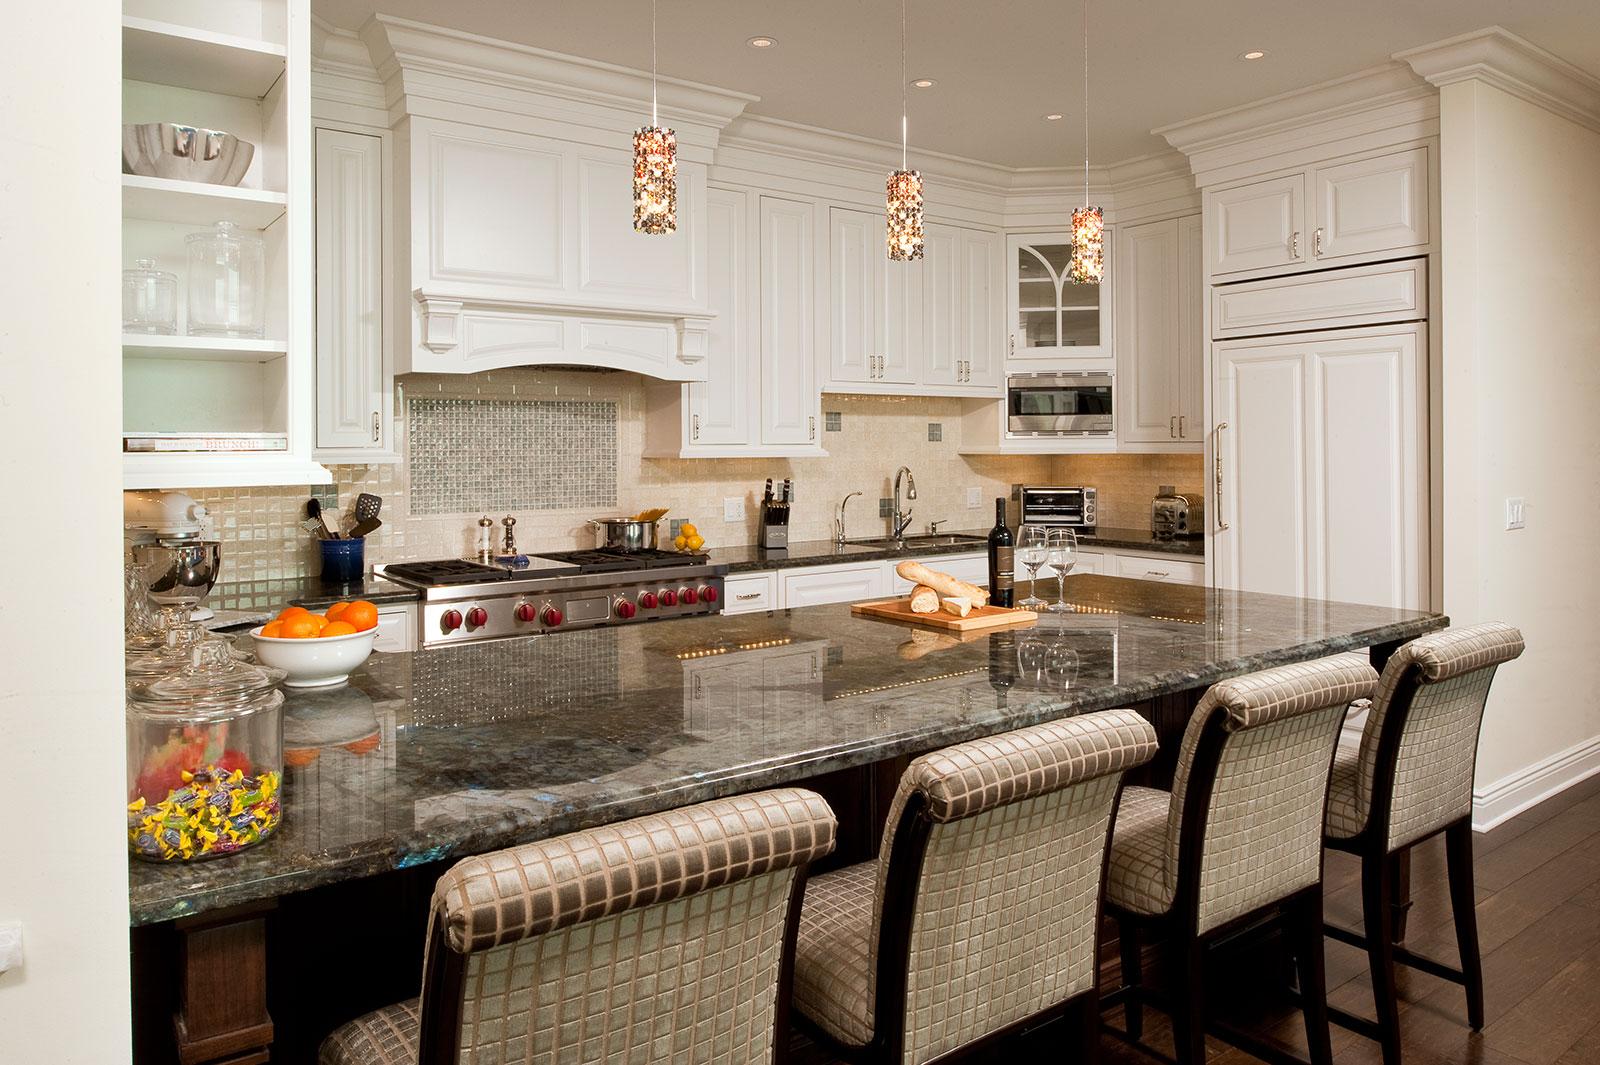 Custom Kitchen and Cabinets Buffalo Waterfront